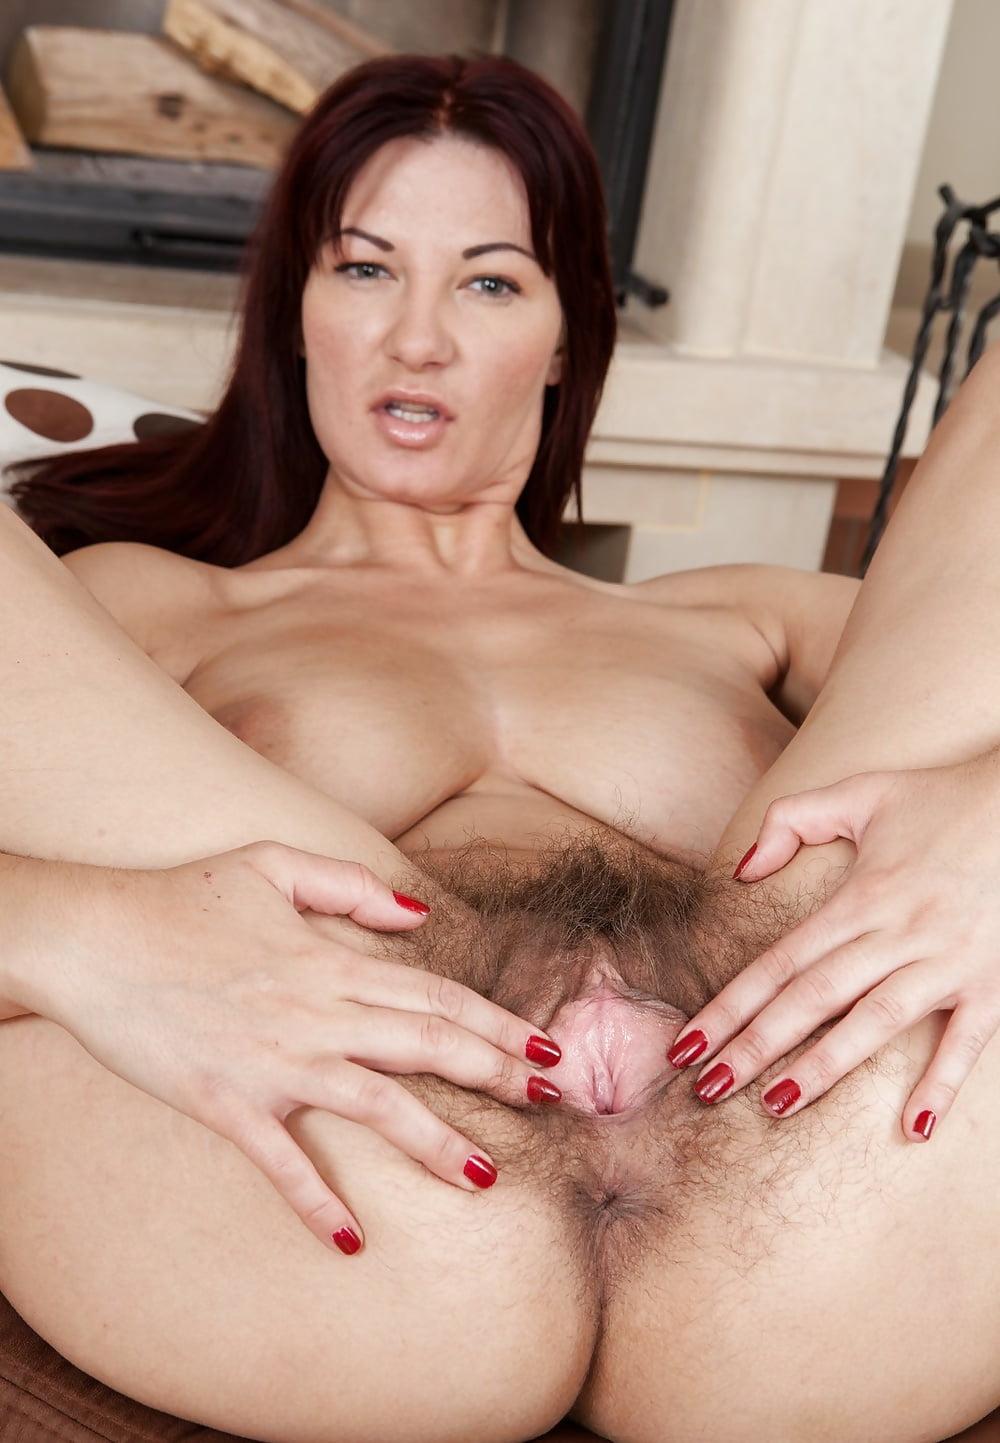 Vanessa simmons pussy, deepika padukone fucked nude biggest boobs